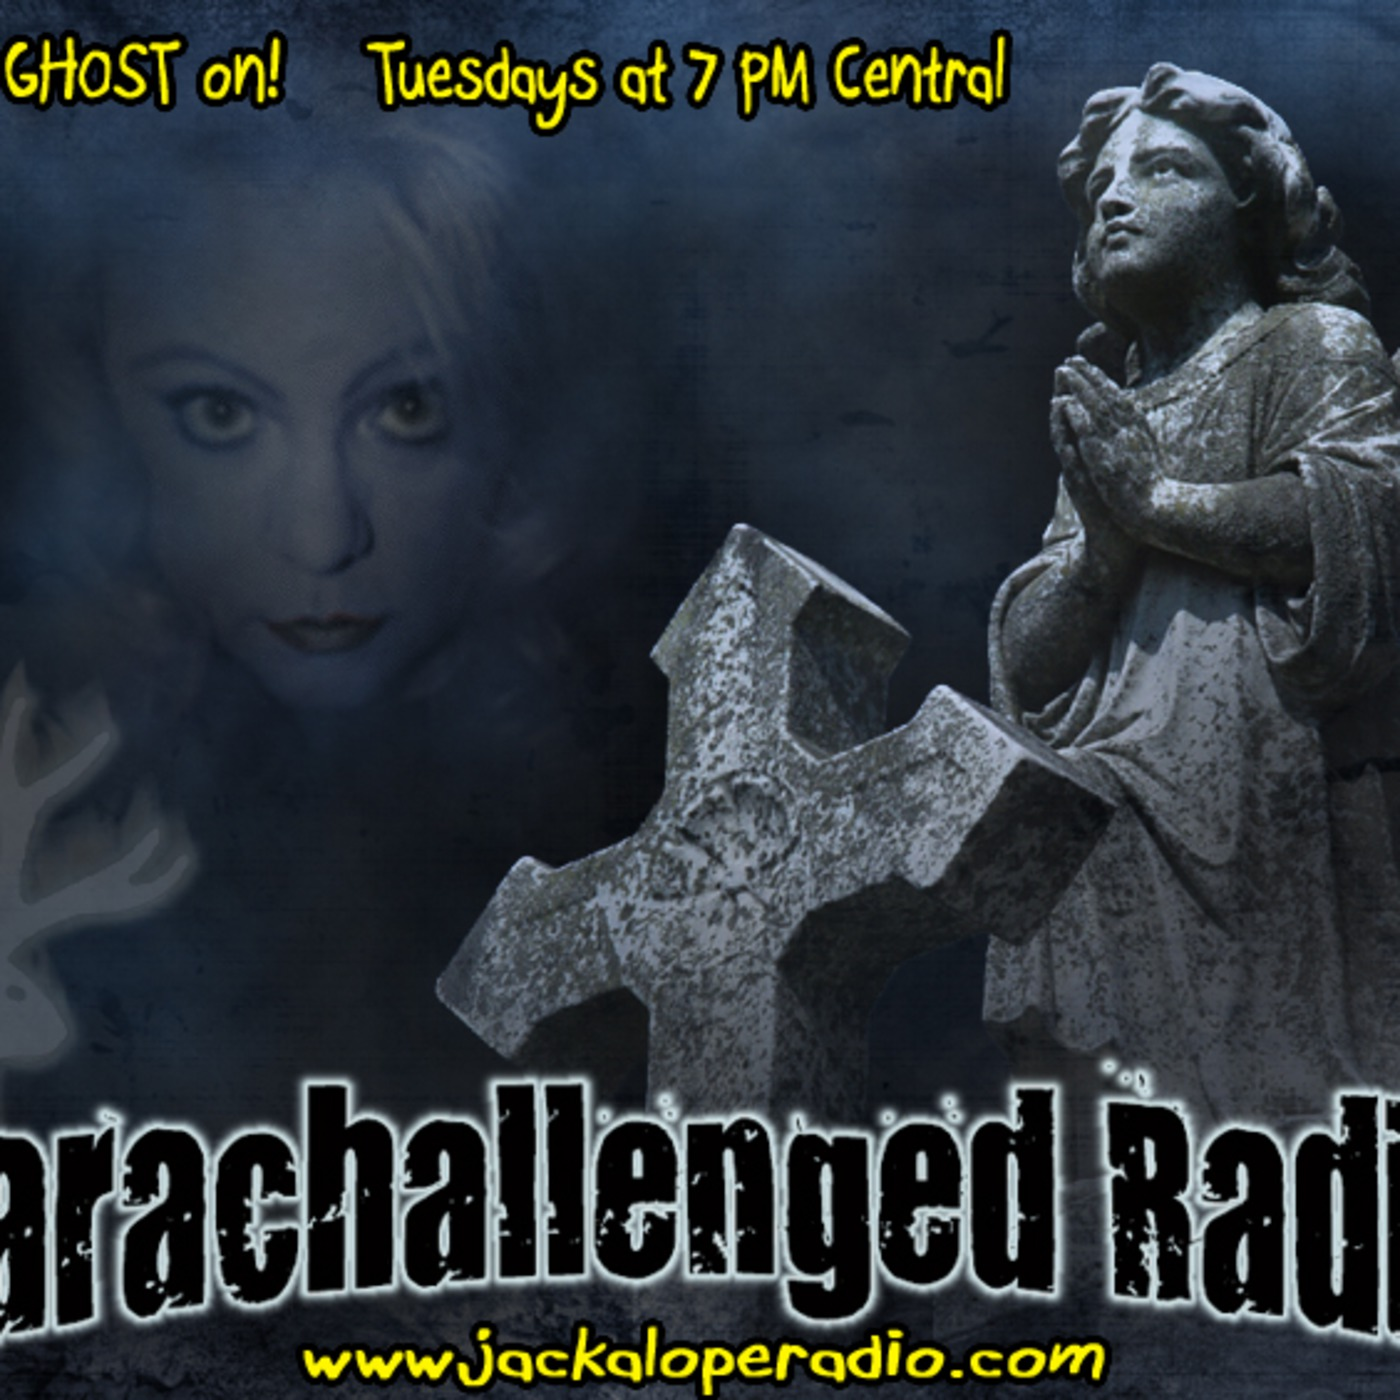 ParaChallenged Radio